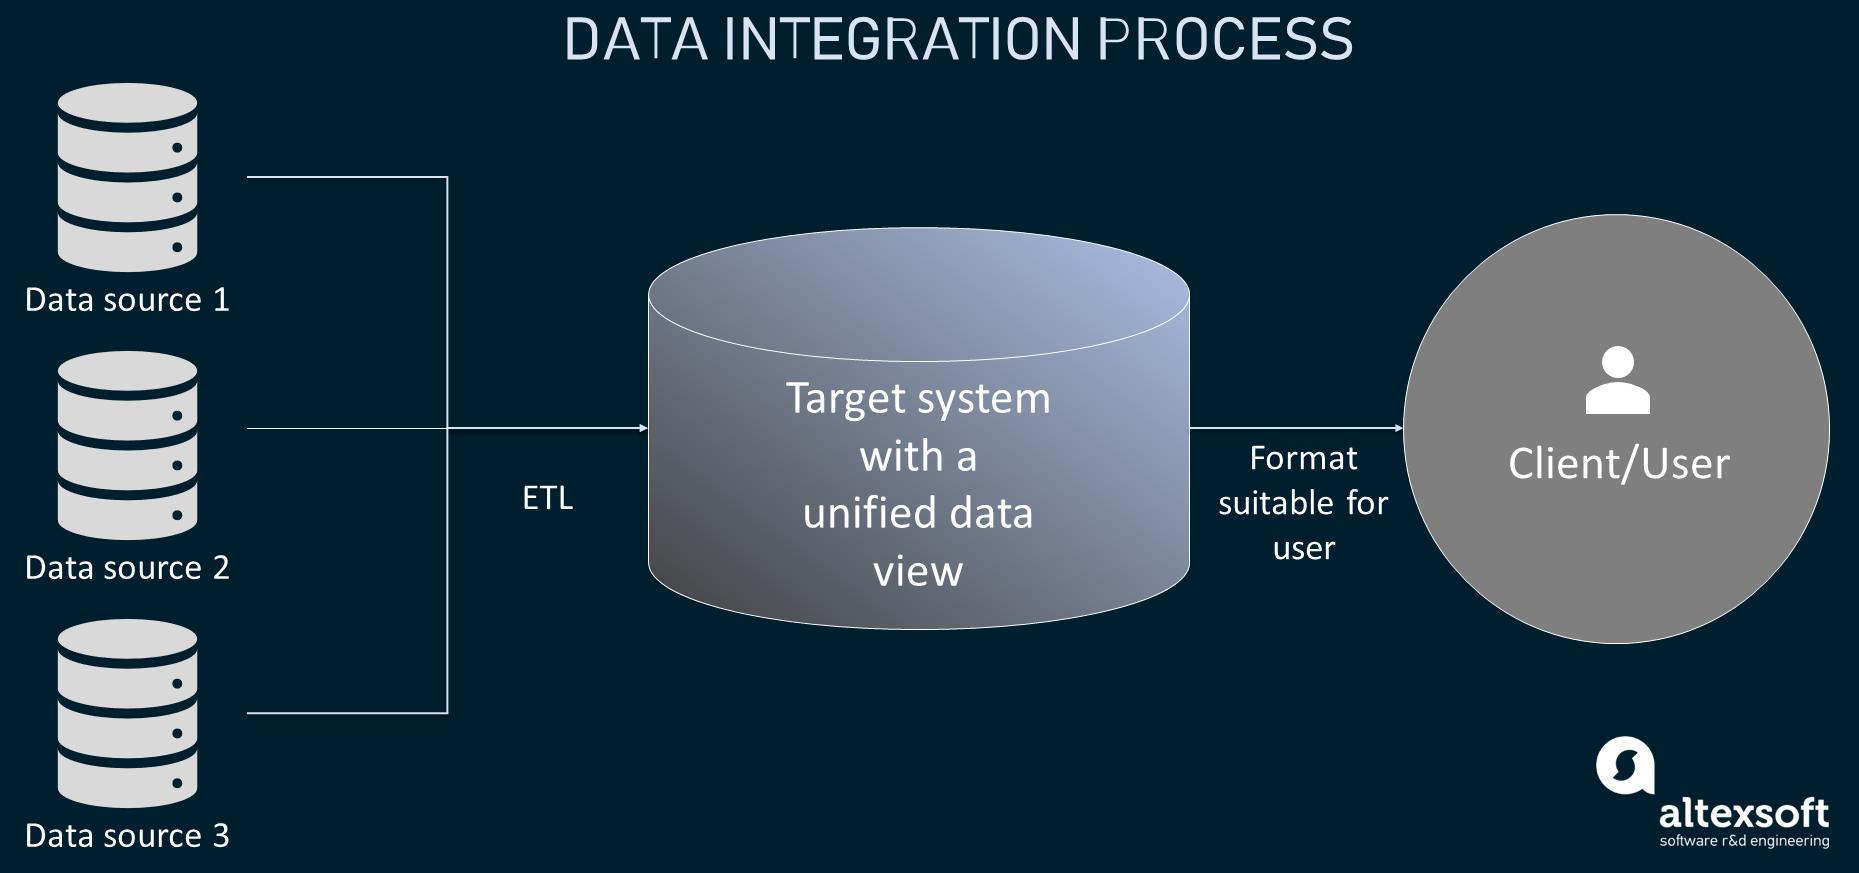 Data integration process